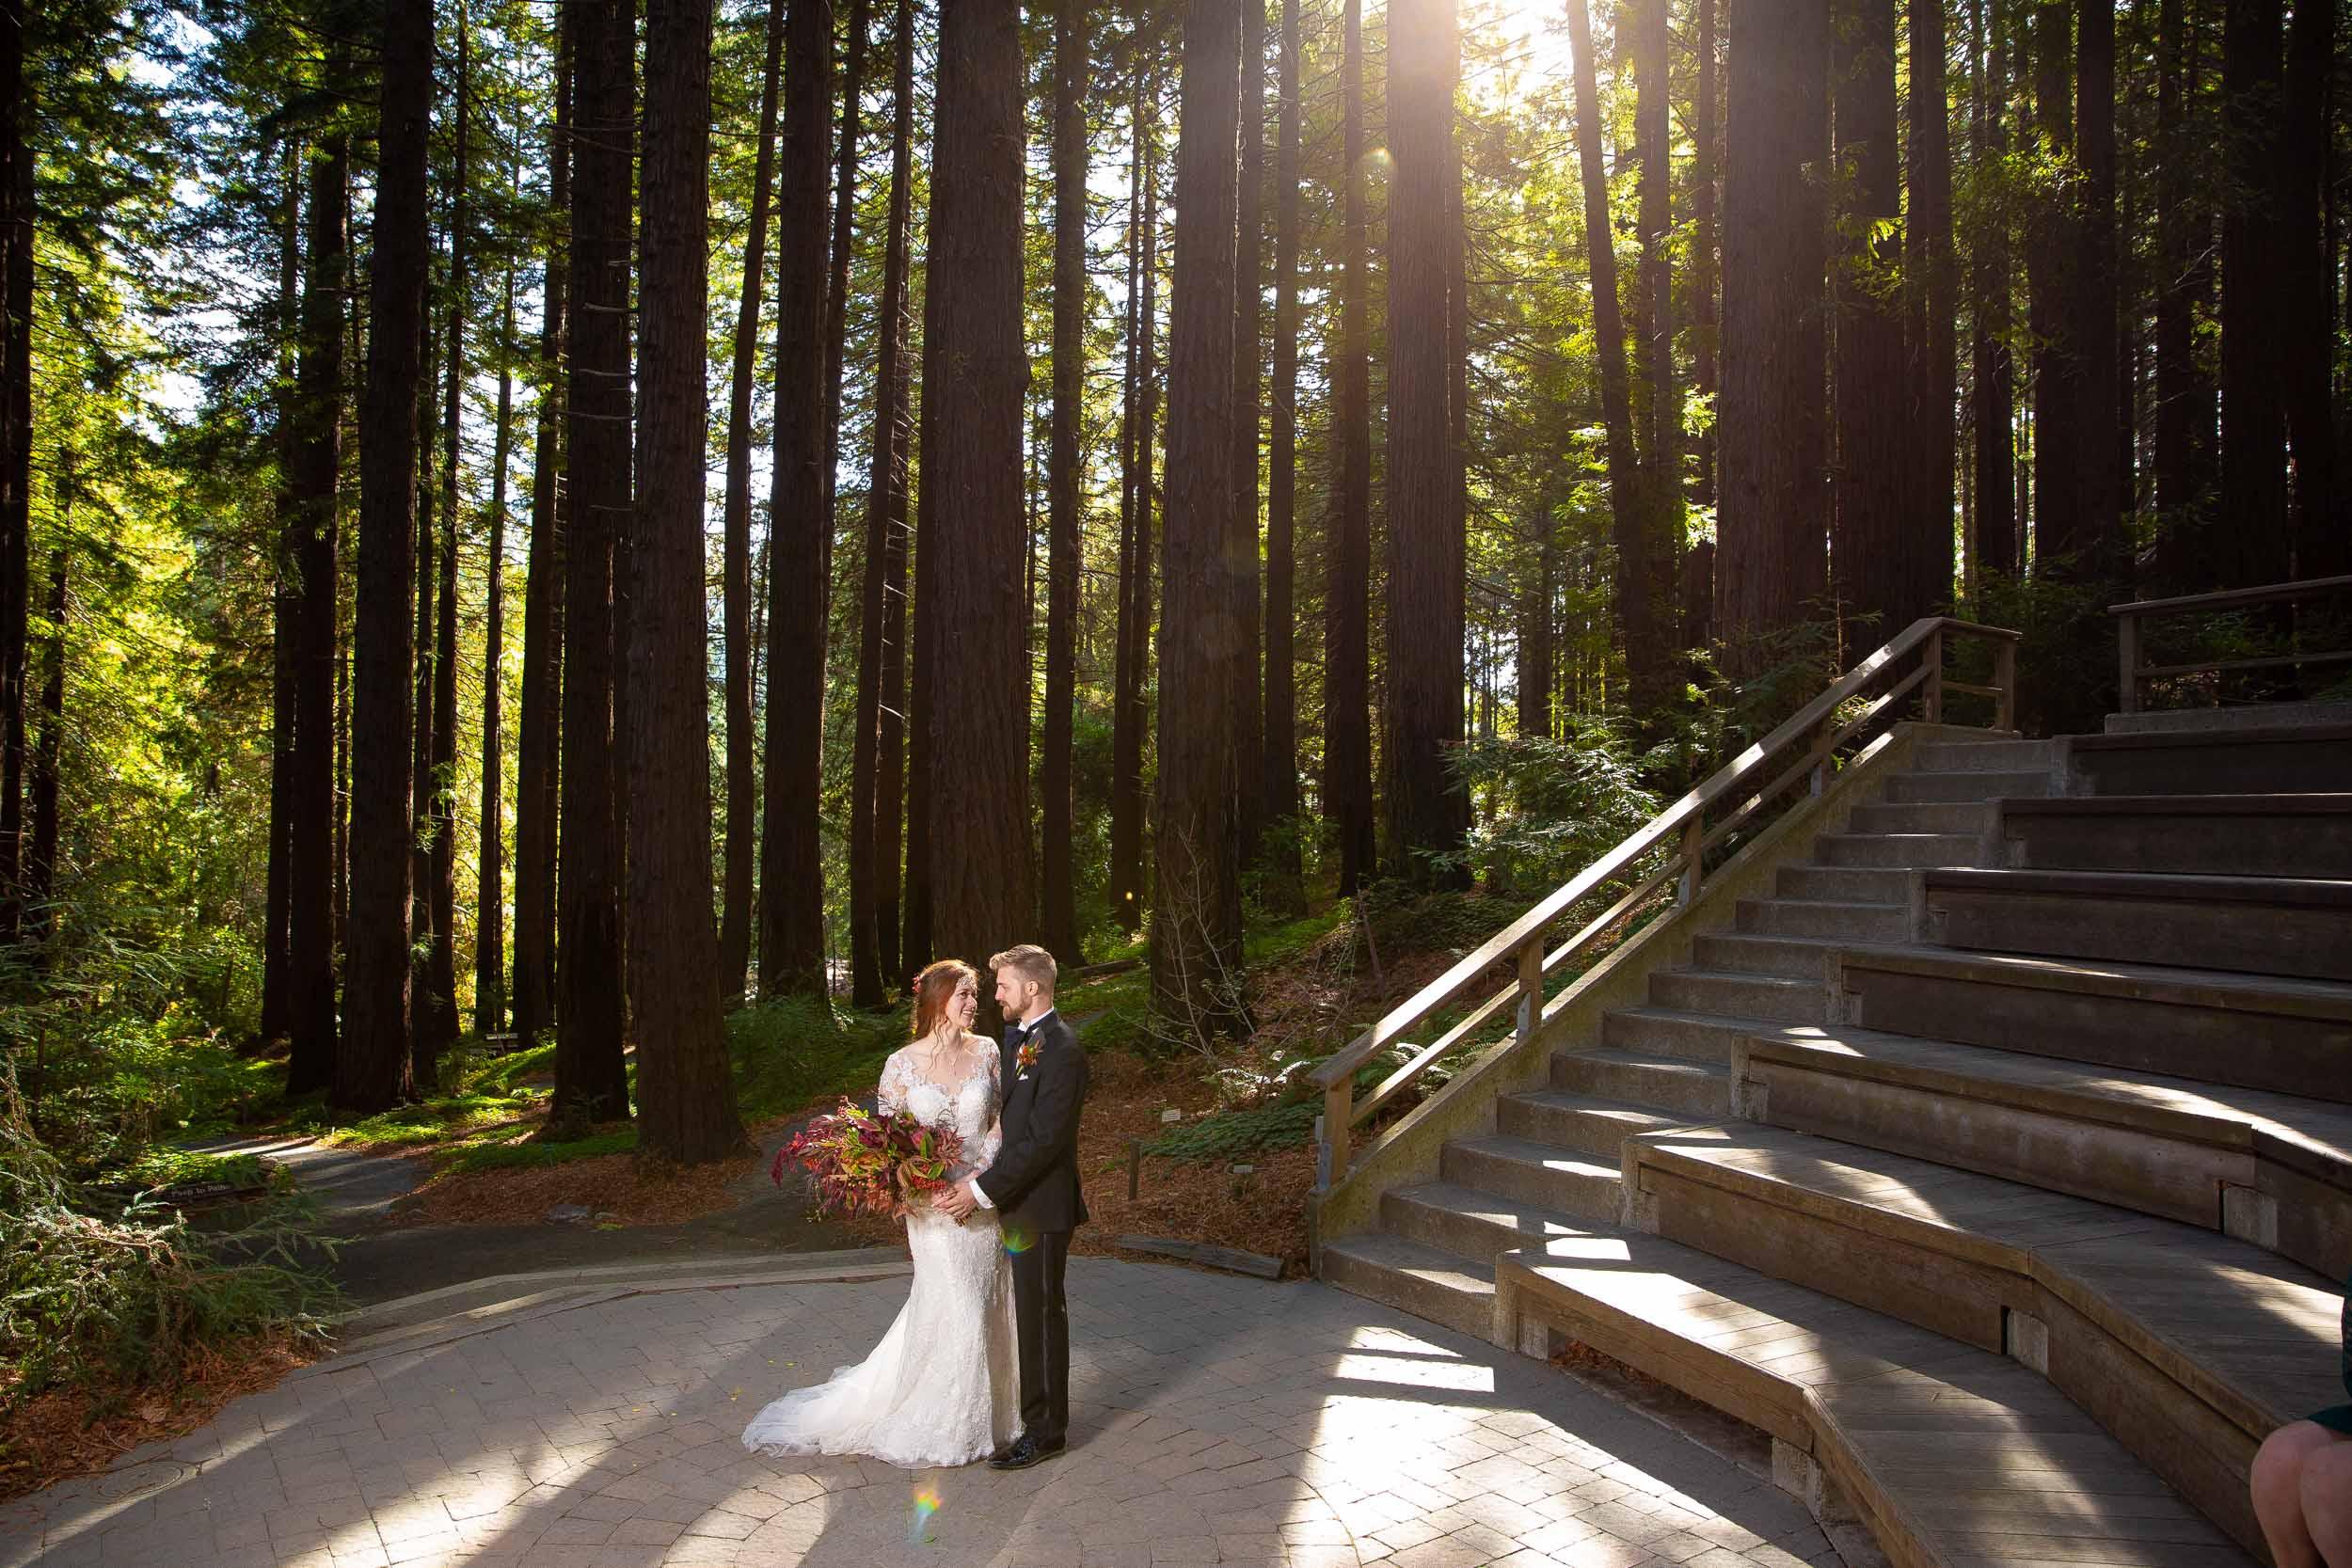 Berkeley Botanical Garden Wedding Ceremony in the Redwood Grove Ceremony and SF Bay Wedding Cruise Reception-47.jpg